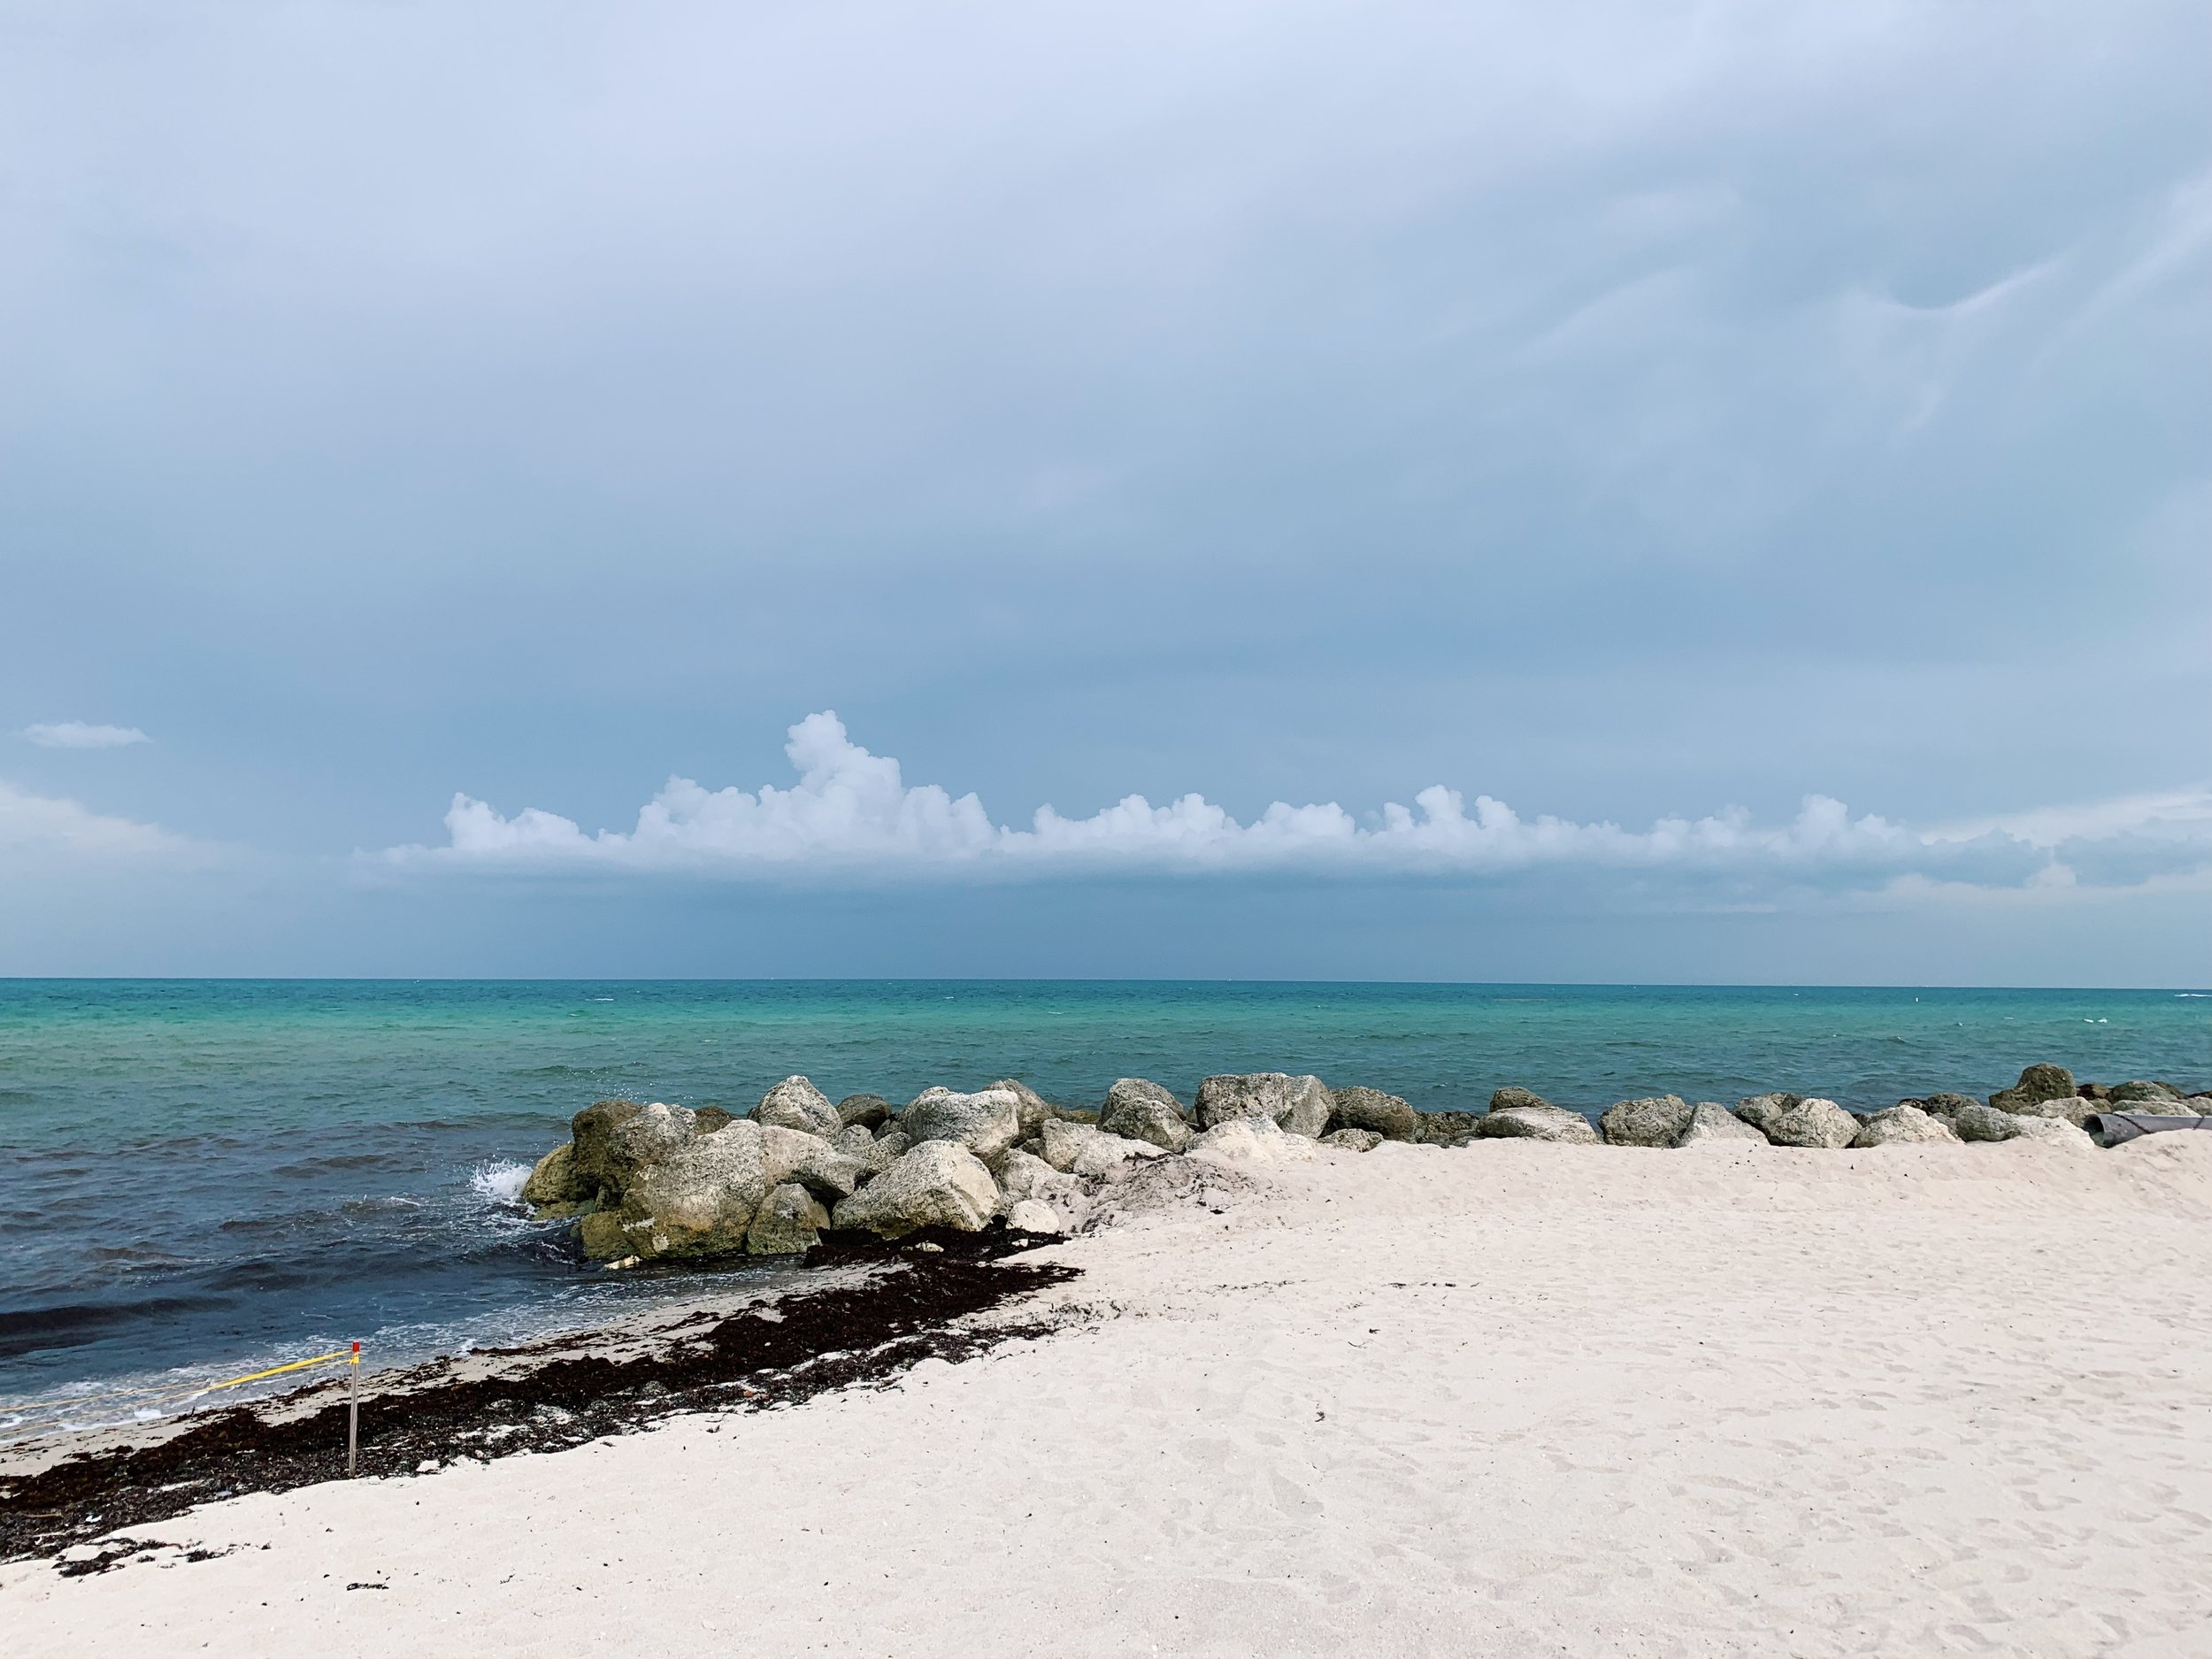 All-natural beauty | Miami Beach